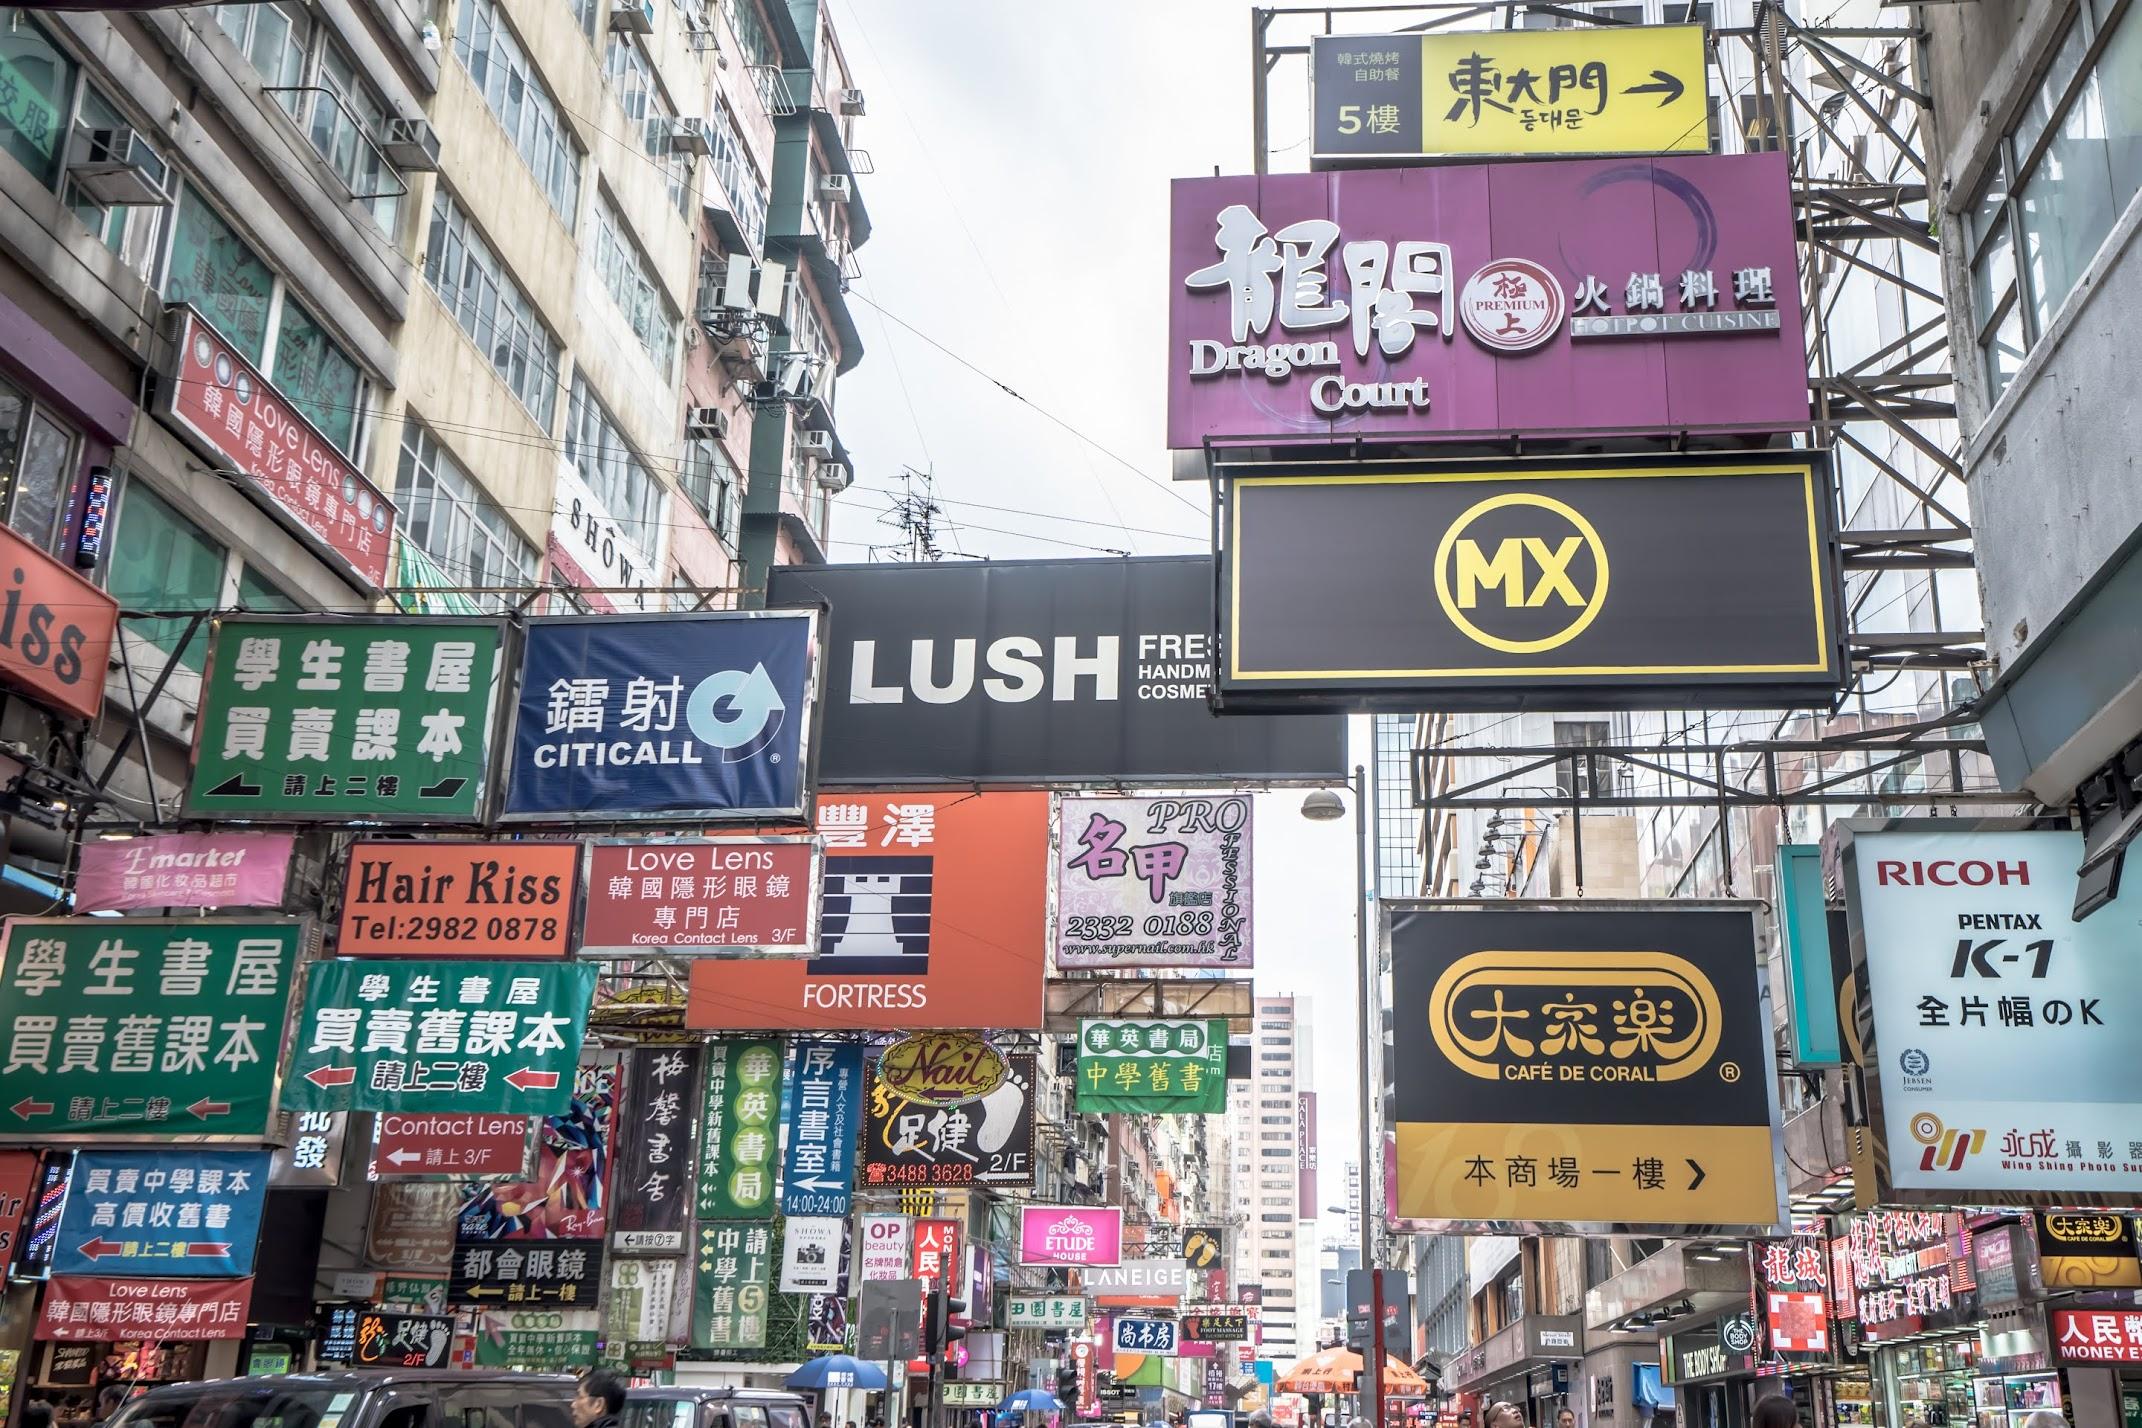 Hong Kong Mong Kok2